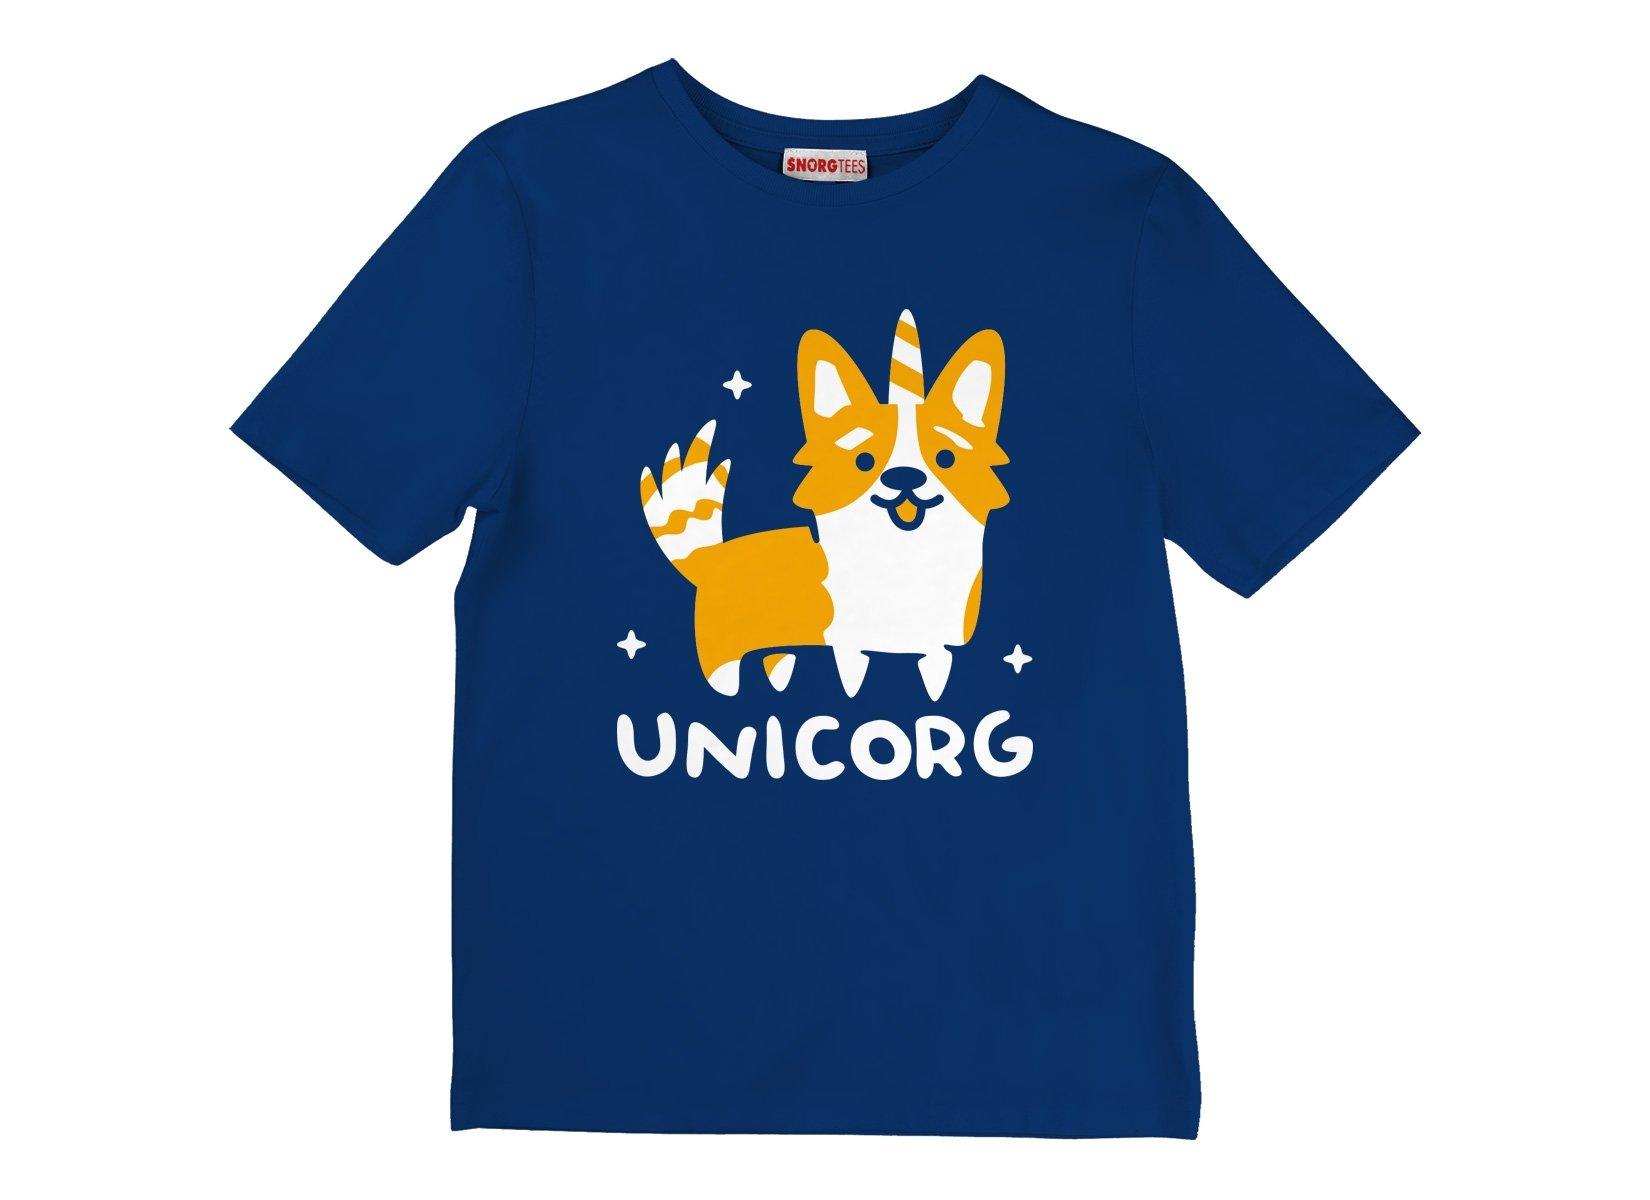 Unicorg on Kids T-Shirt